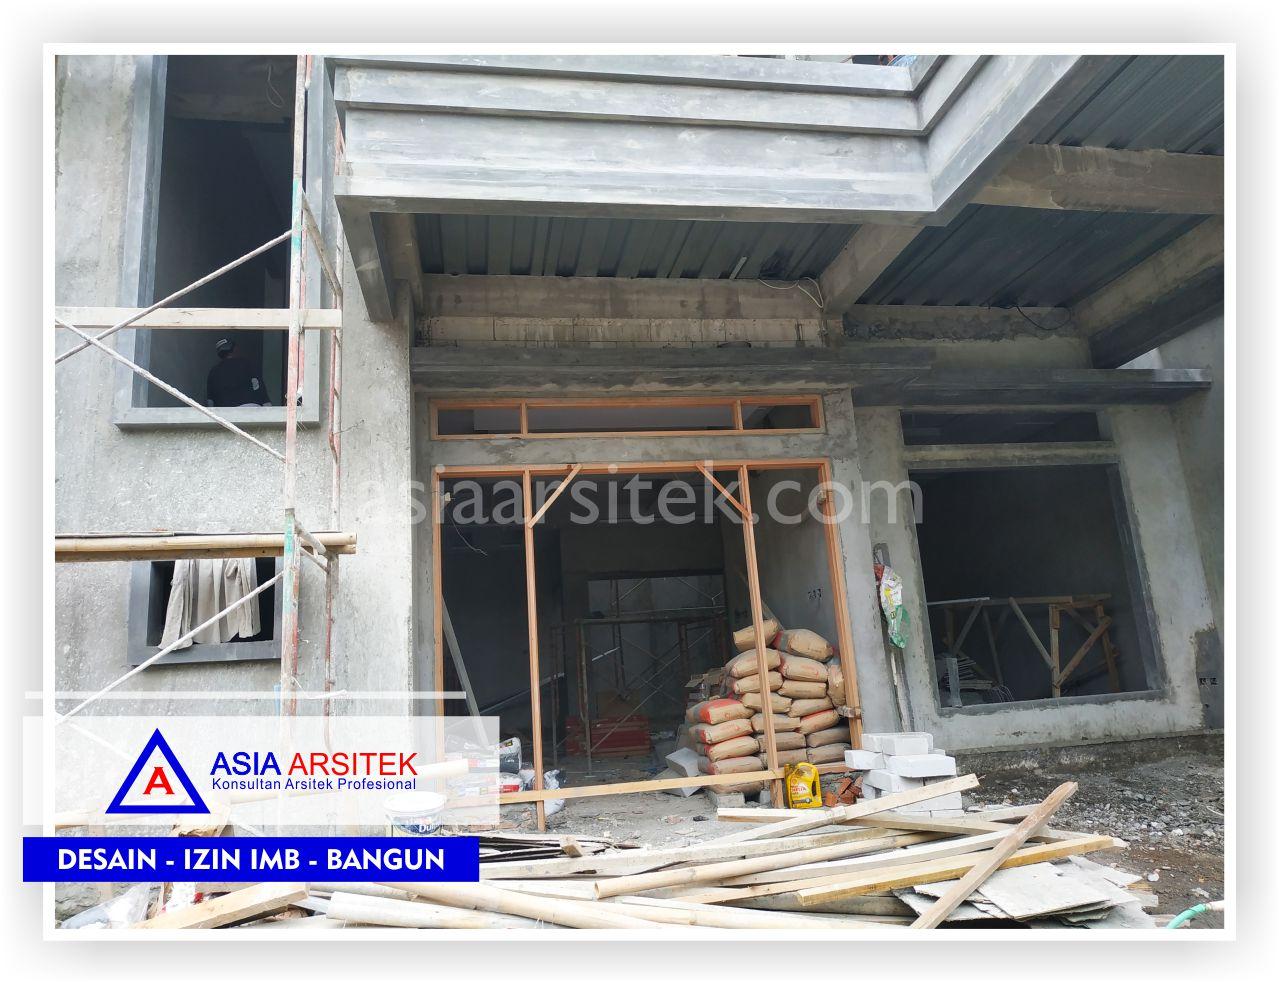 Finishing Accian Rumah Bpk Hendra Sun Kho - Arsitek Desain Rumah Minimalis Modern Di Tangerang-Jakarta-Bogor-Bekasi-Bandung-Jasa Konsultan Desain Arsitek Profesional (1)